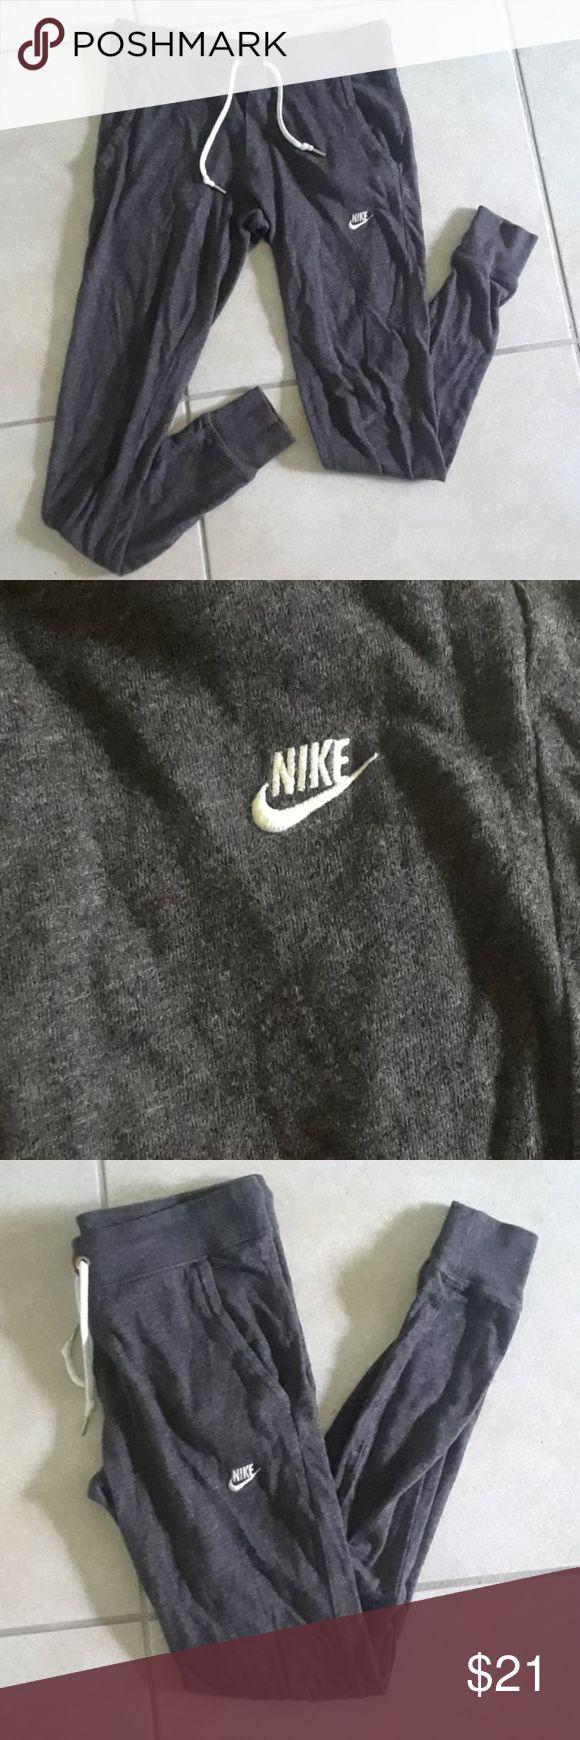 Nike Joggers Like new. Dark grey Nike Joggers. Super comfy material. Size XS. Nike Pants Track Pants & Joggers